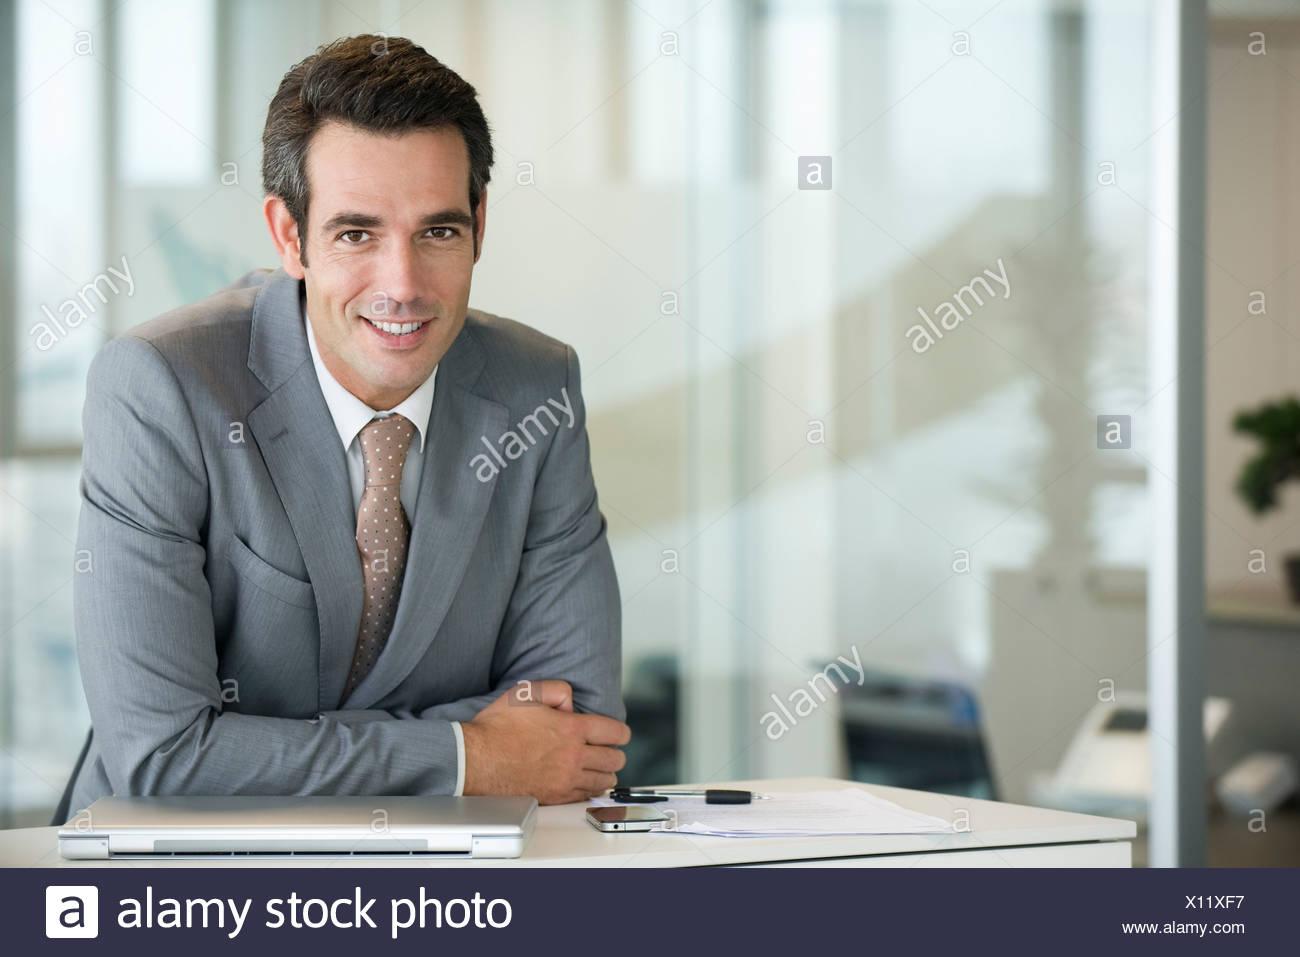 Male executive, portrait - Stock Image